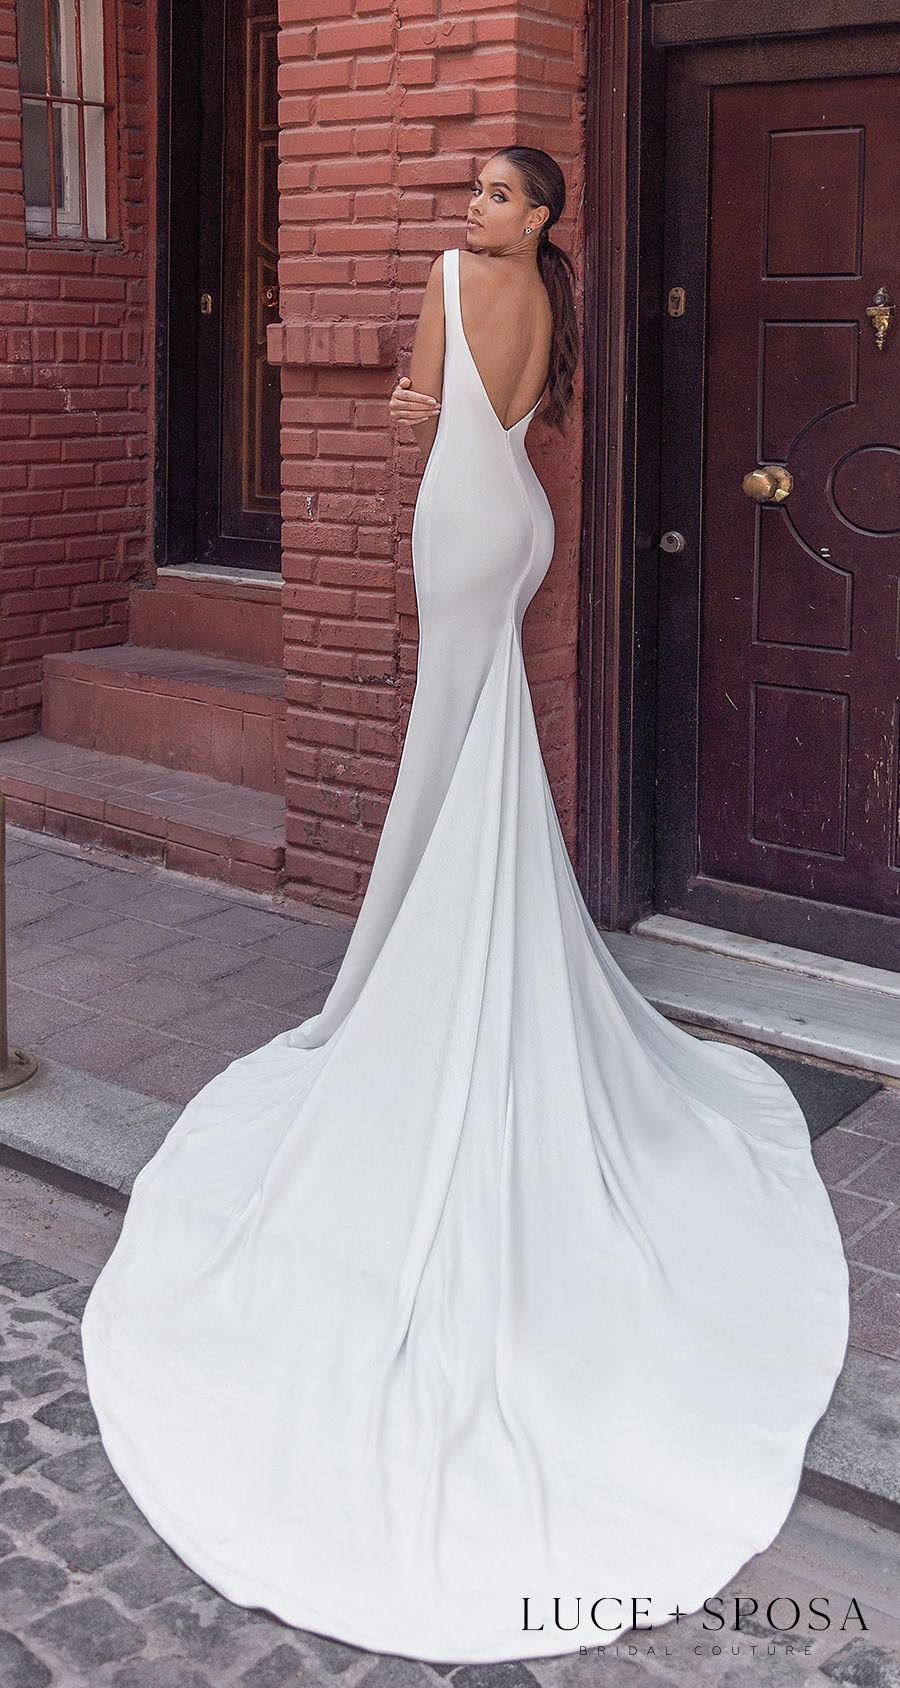 luce sposa s2021 istanbul bridal sleeveless deep v neck simple minimalist slit skirt elegant sheath wedding dress low v back chapel train (royalty) bv